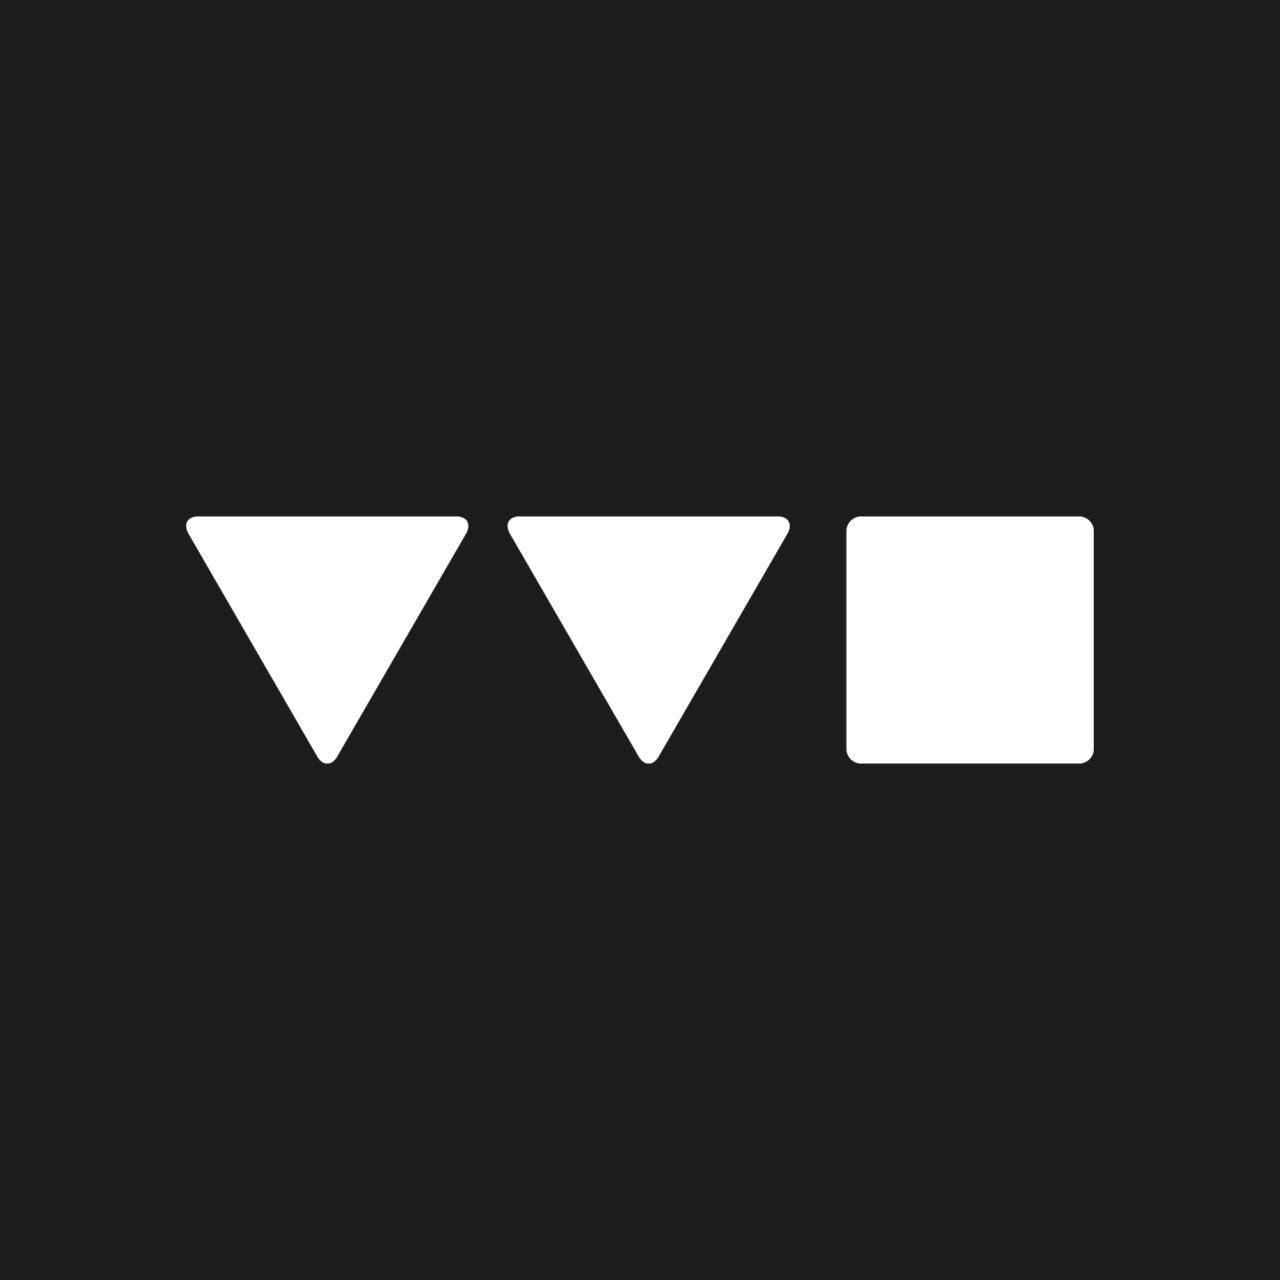 Waxlife_logo_2016_white